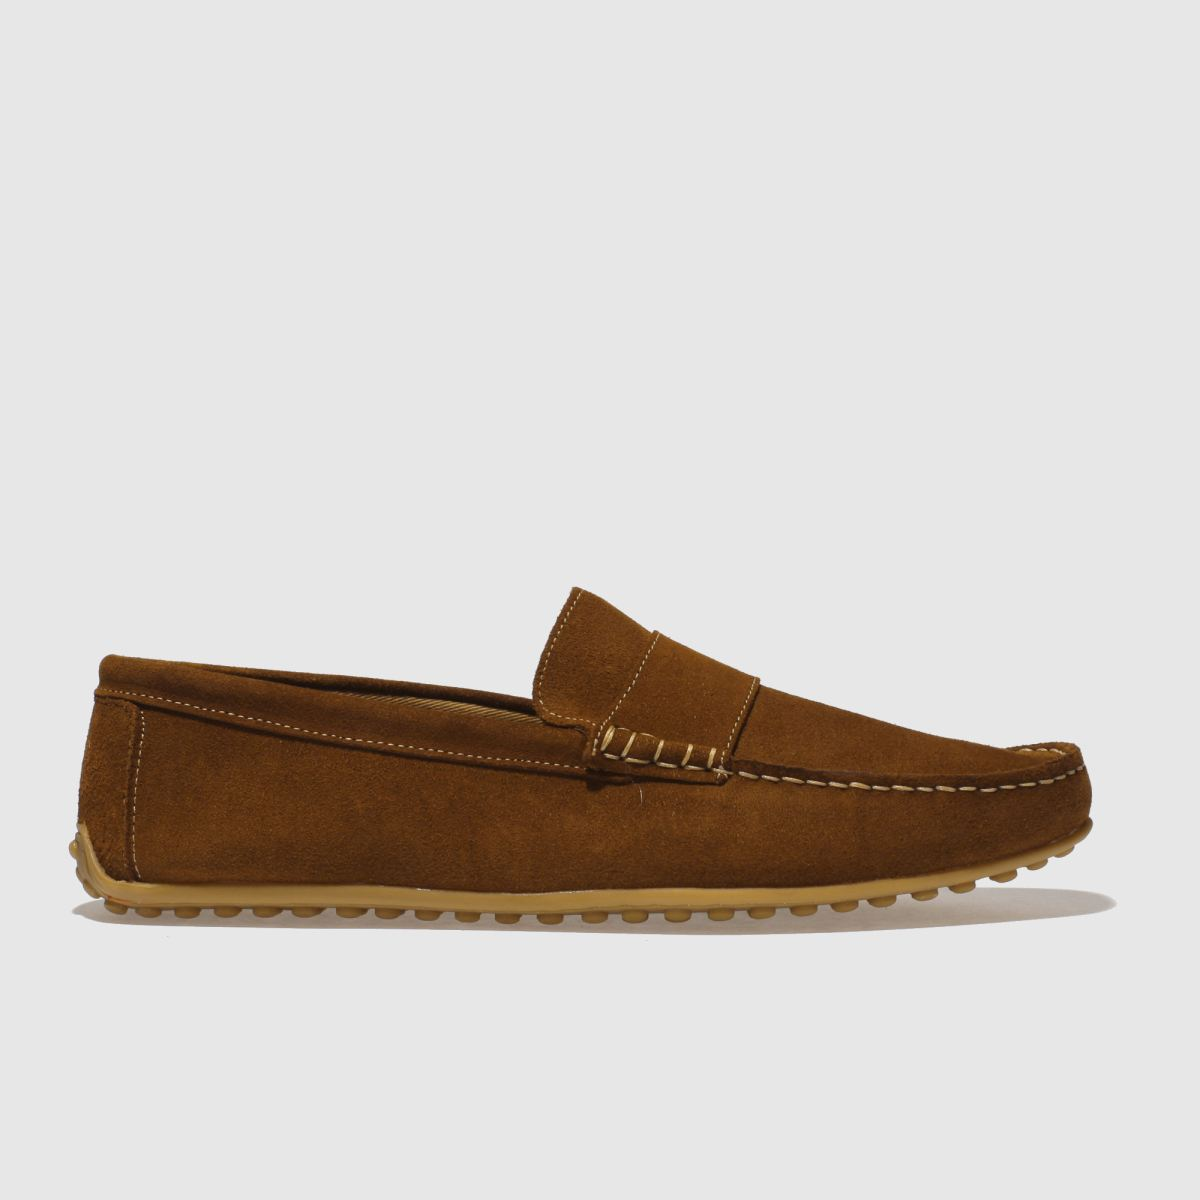 Schuh Tan Mario Driver Shoes